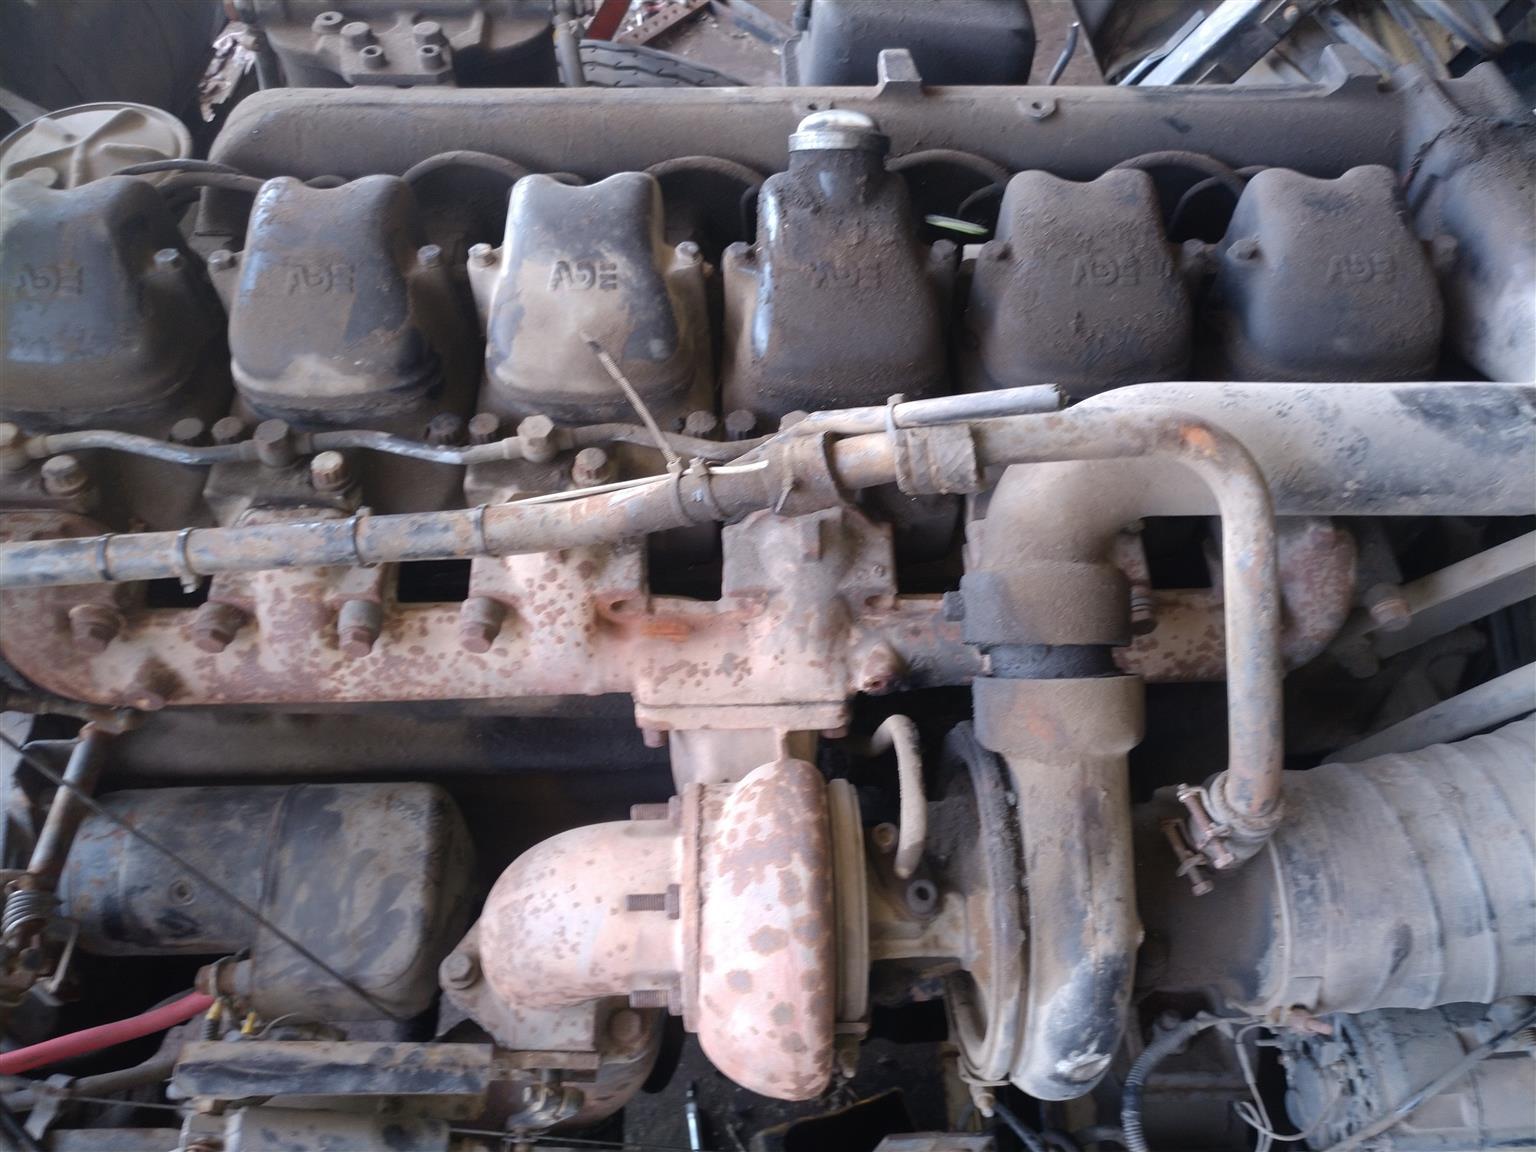 Ade 407 Turbo